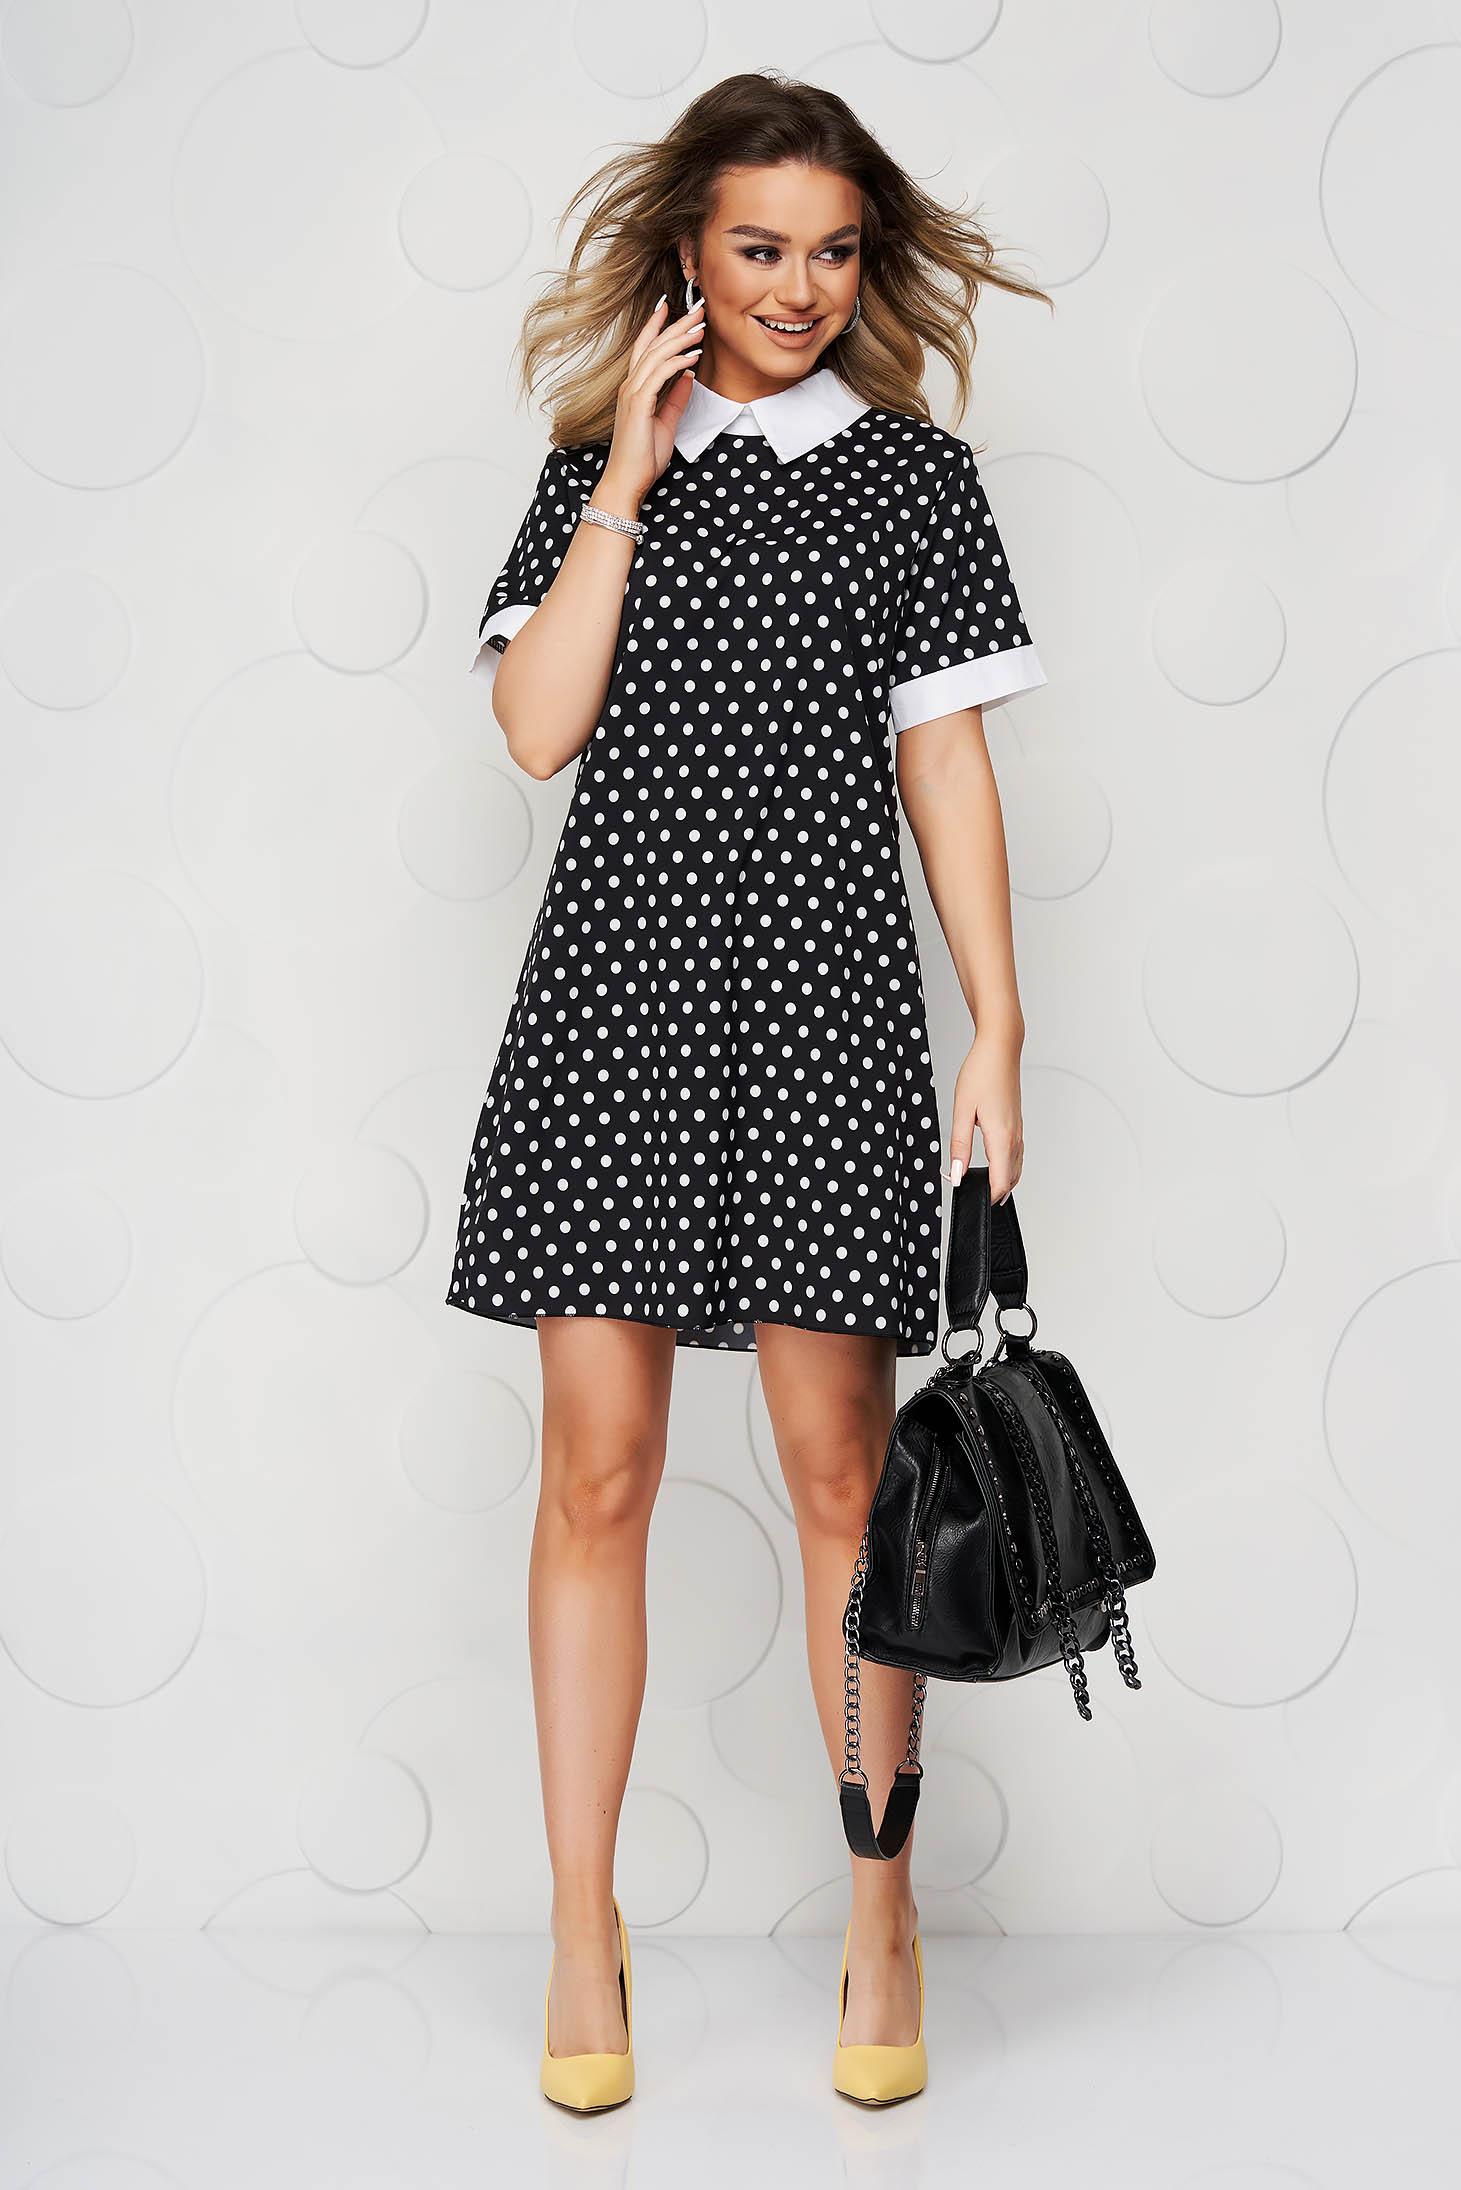 Black dress dots print airy fabric straight